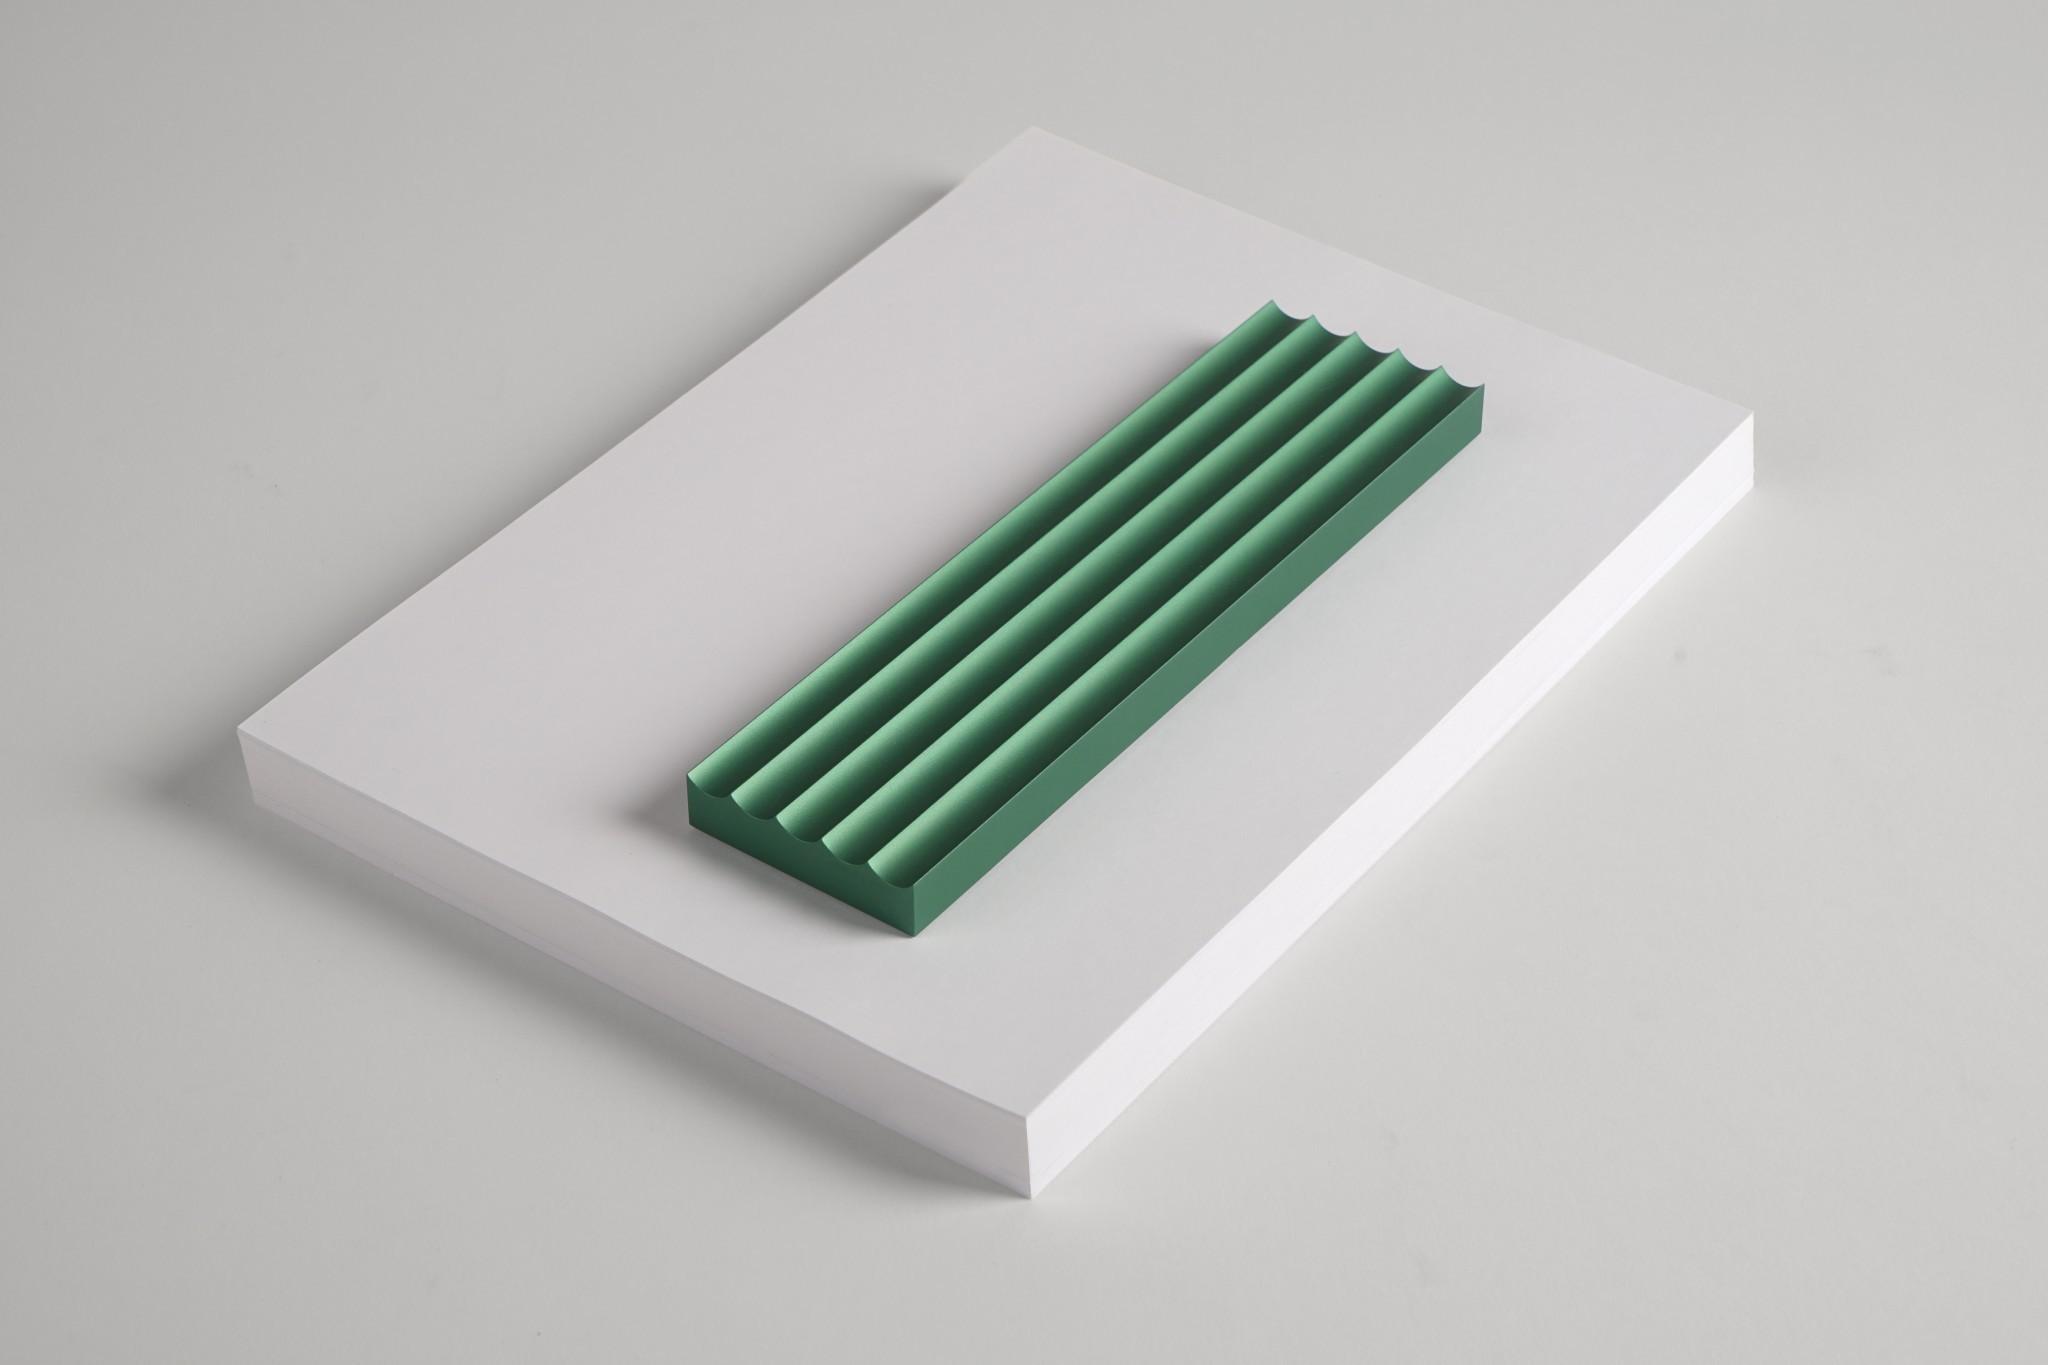 Minimalist Series of Objects Created by Hangzhou Designer Mario Tsai